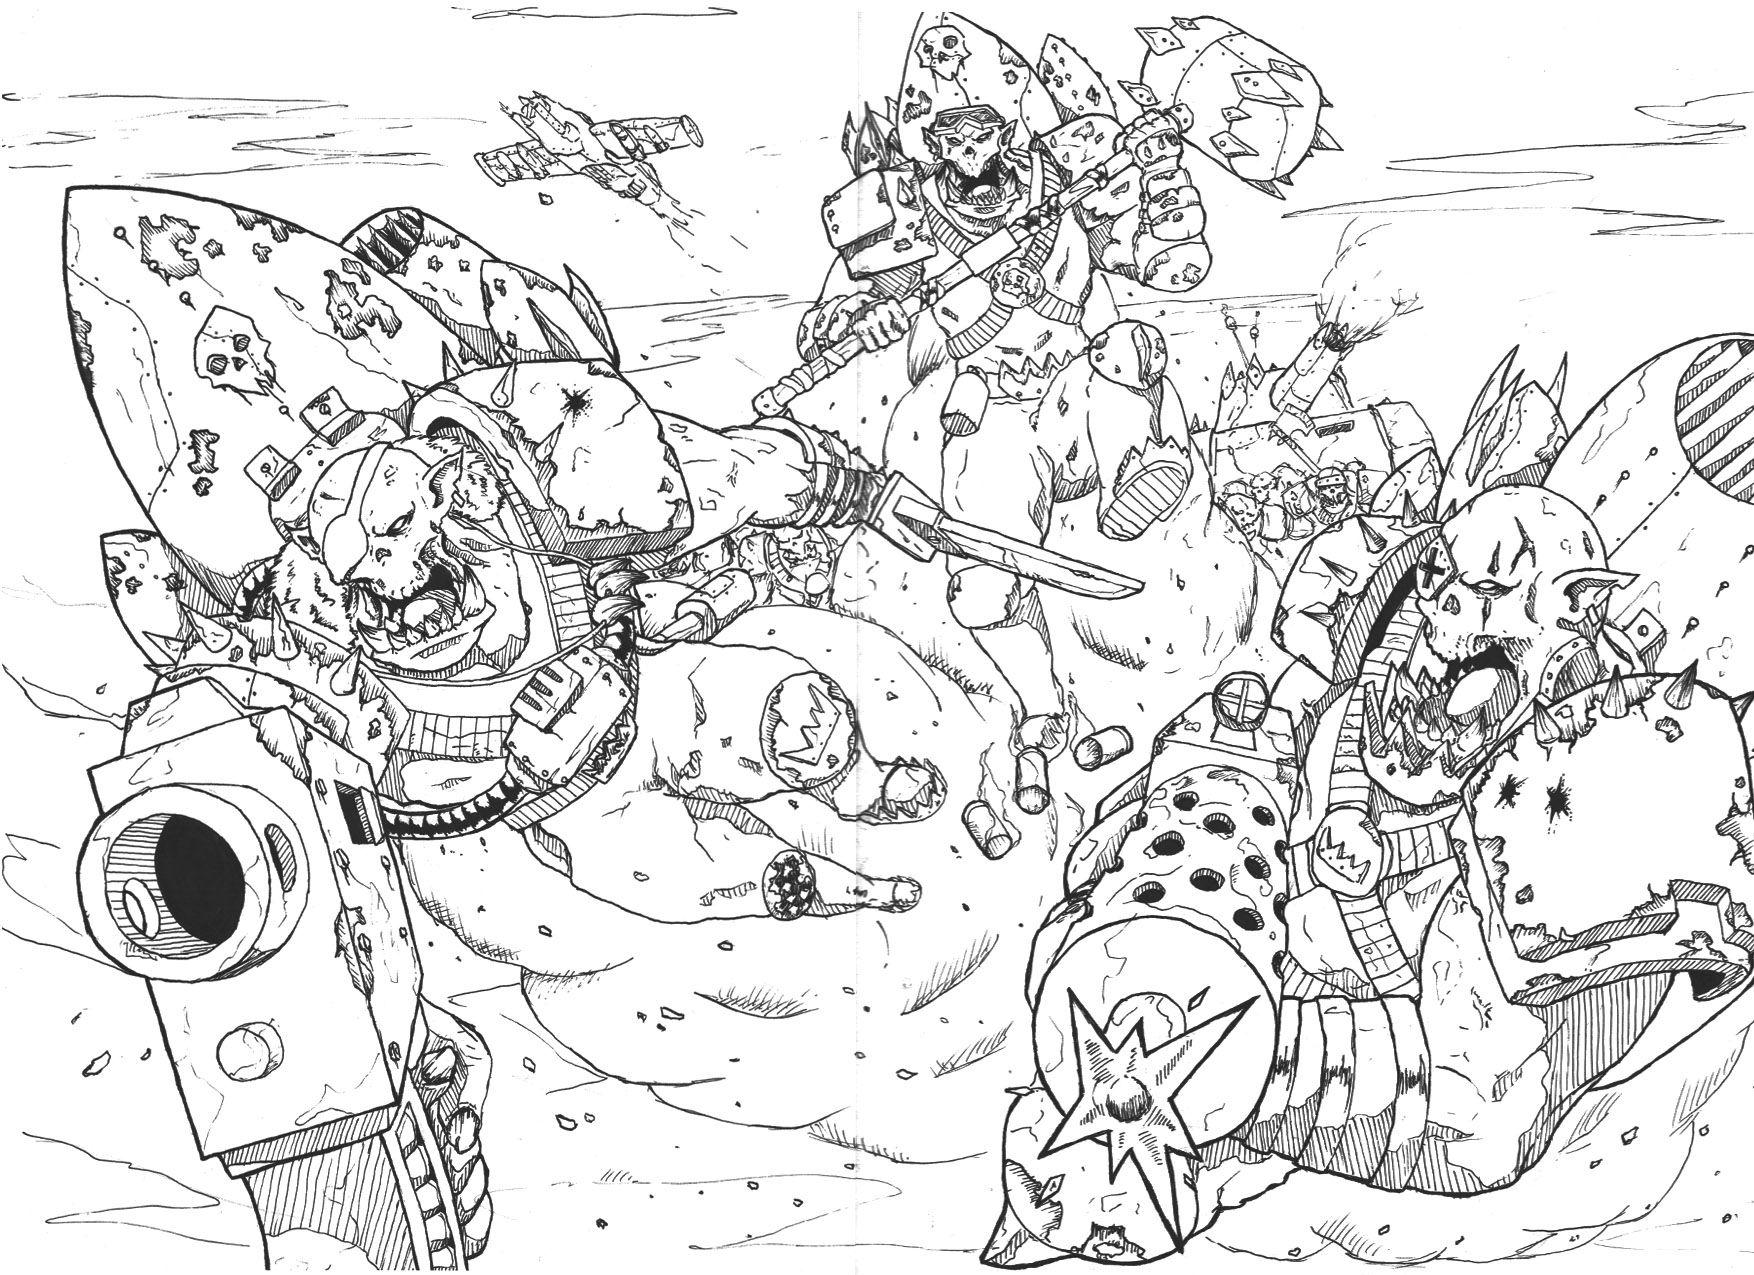 Bw Jump Pack Knife Mydeads Orks Stormboy Warhammer Warhammer